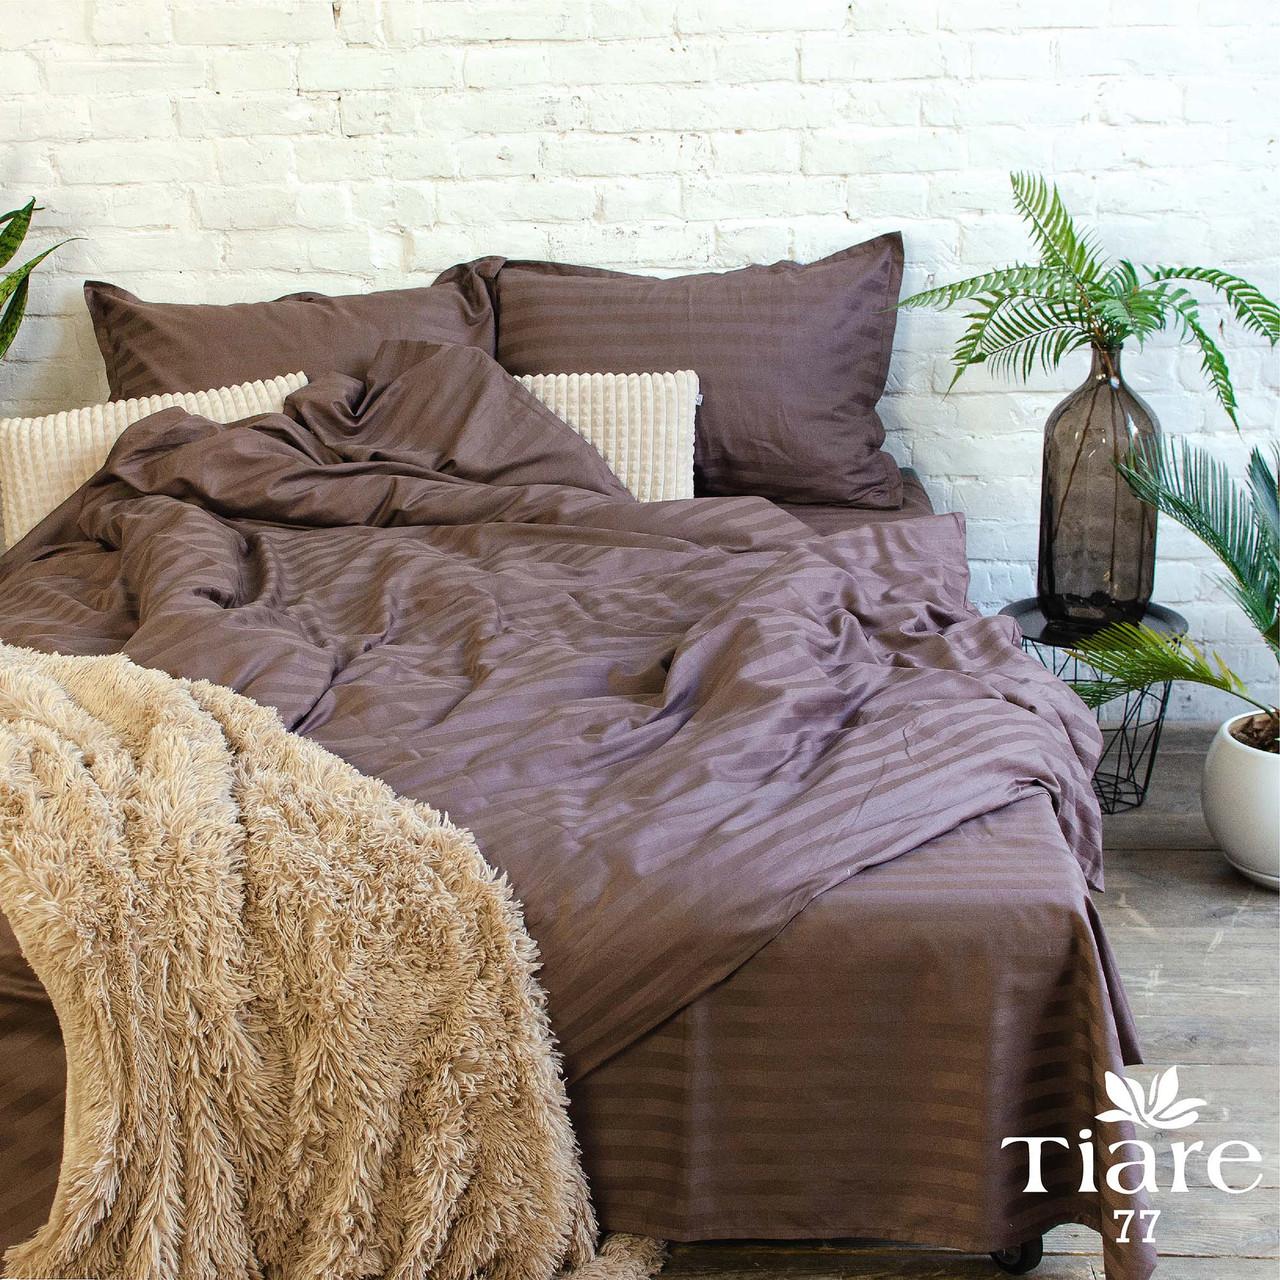 Комплект постельного белья Tiare Евро Сатин Stripe арт. 77